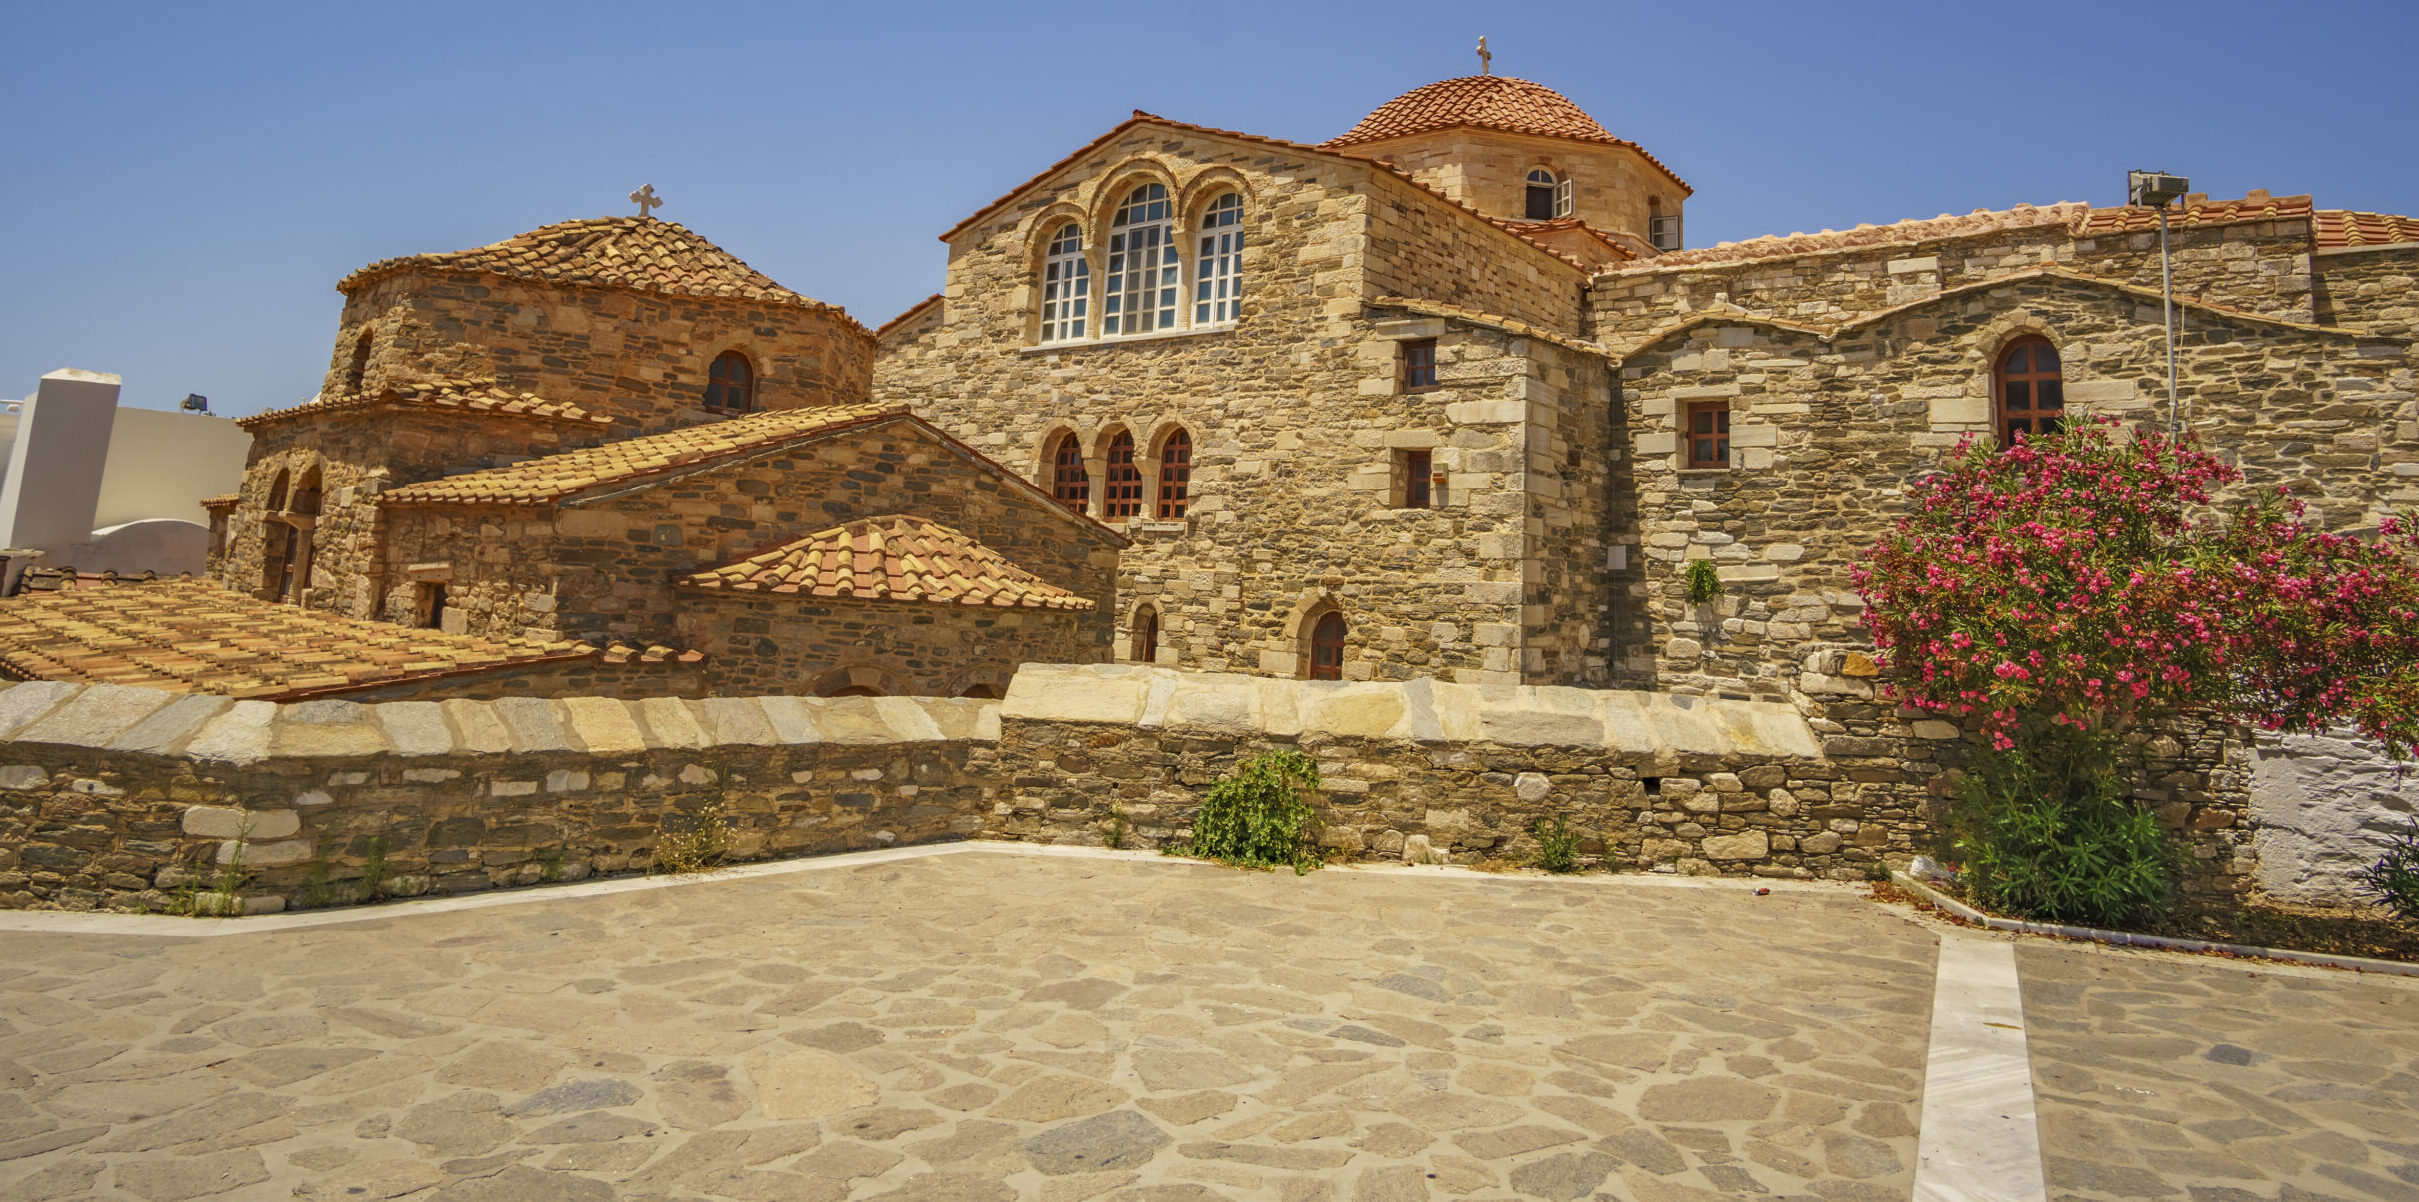 Paros-Panagia Ekatontapyliani: A storm gave birth to this jewelry